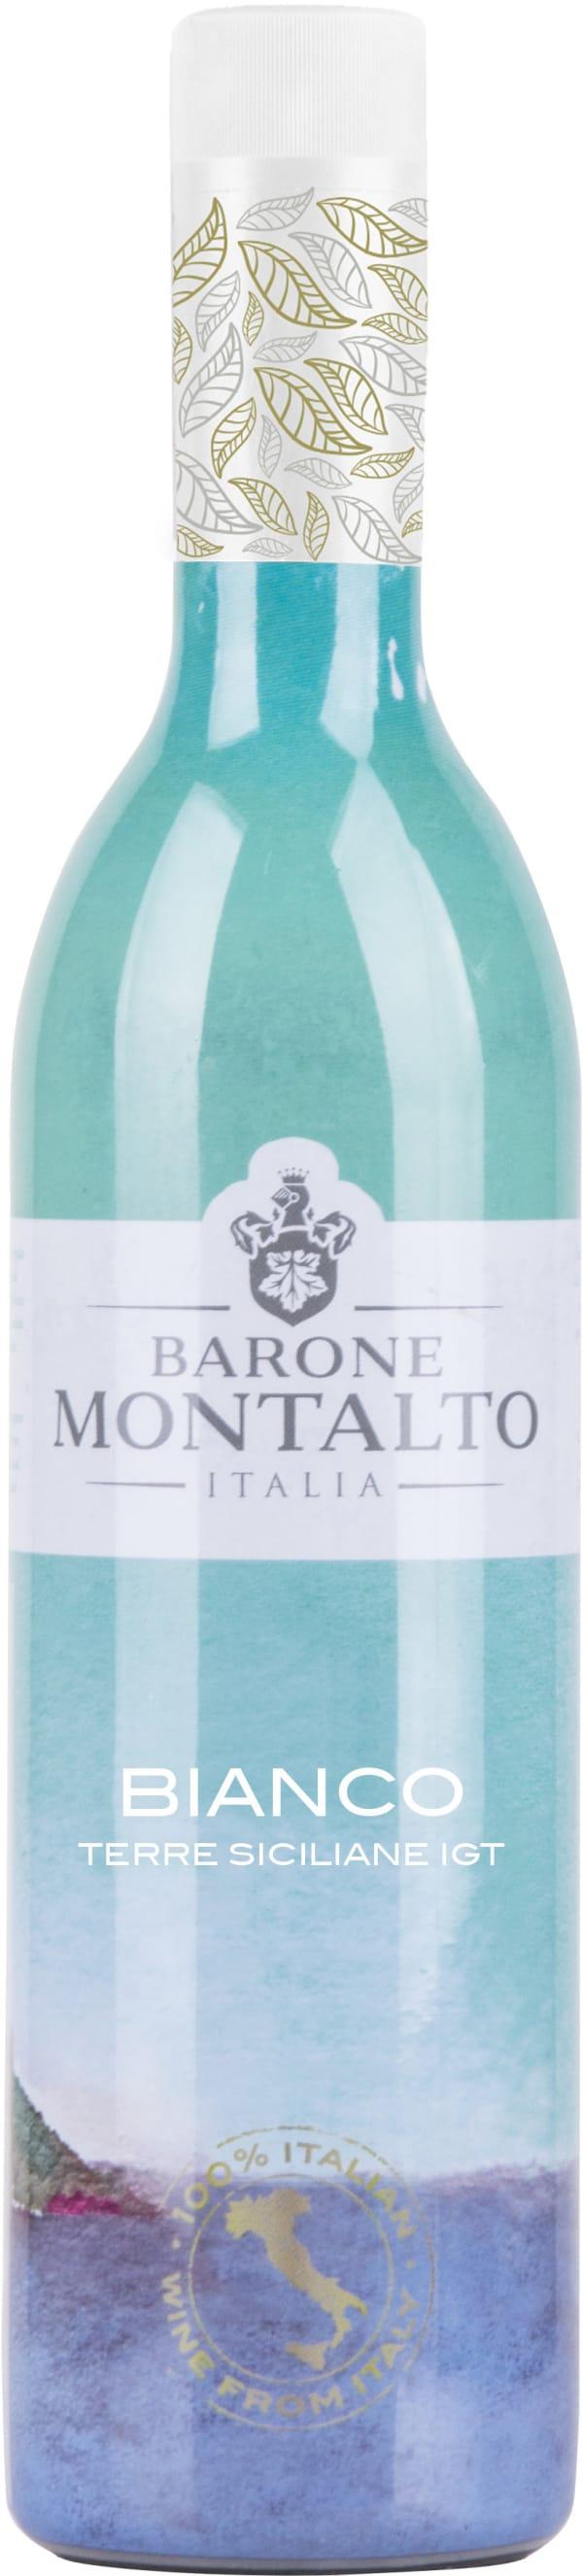 Montalto Grillo Sauvignon Blanc  2016 plastic bottle